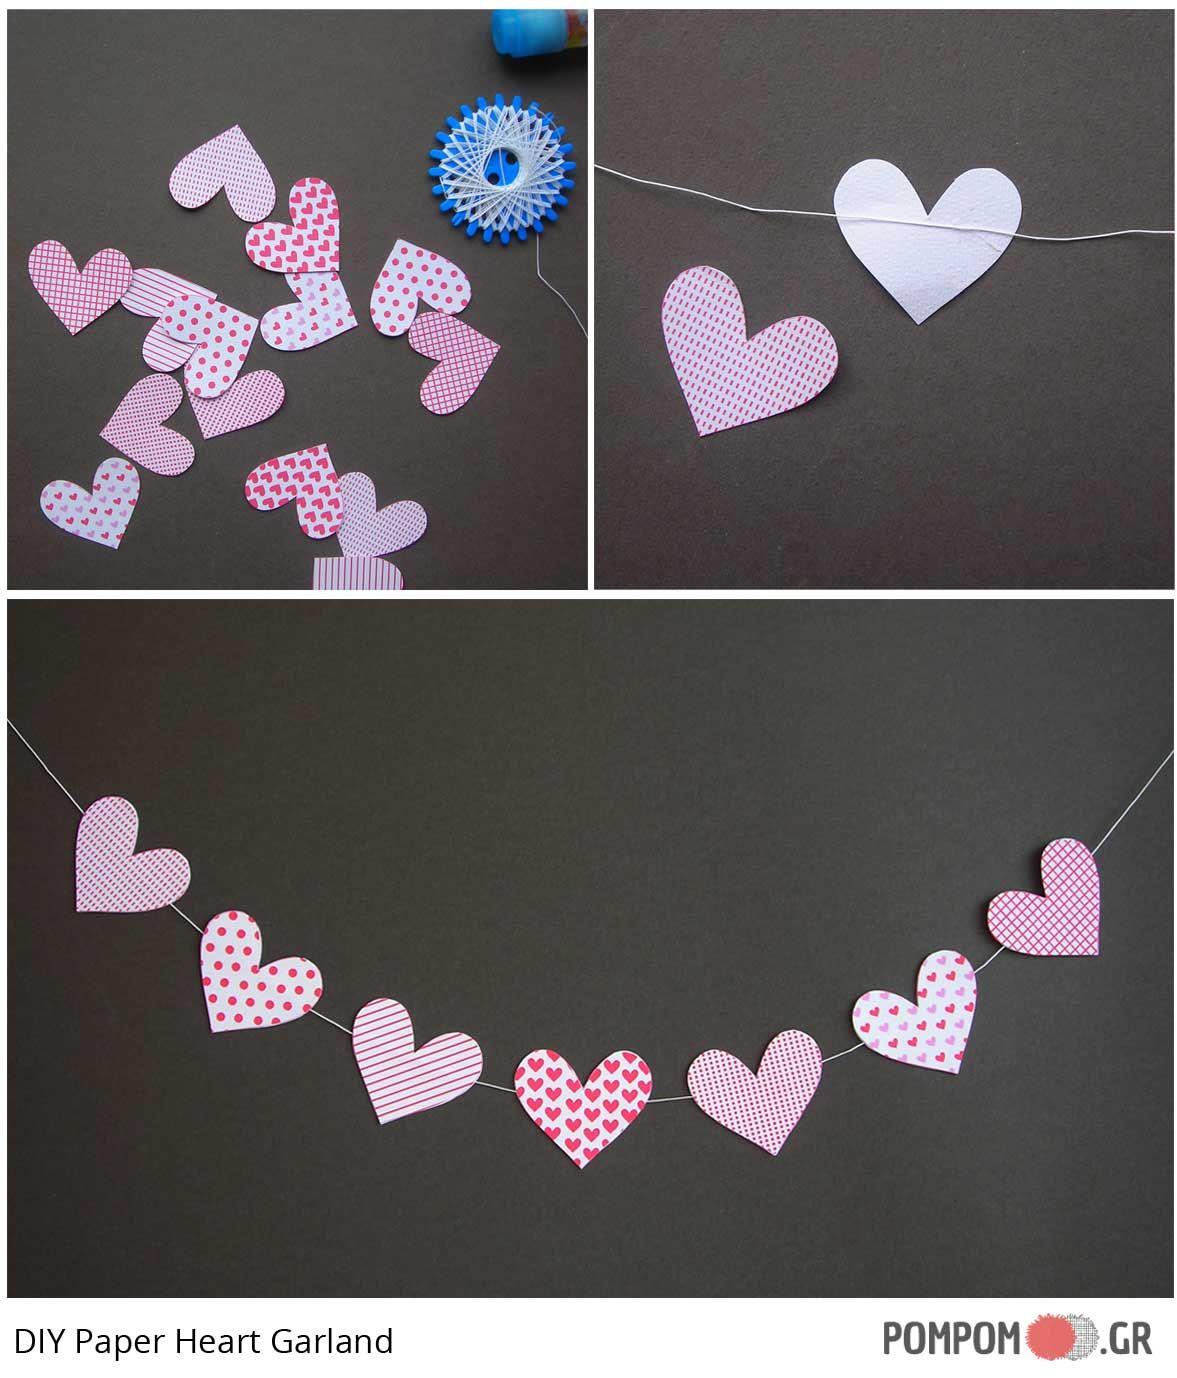 Valentines Day Garland - Freebie - diy γιρλαντα Αγιου Βαλεντινου με δωραν πατρον